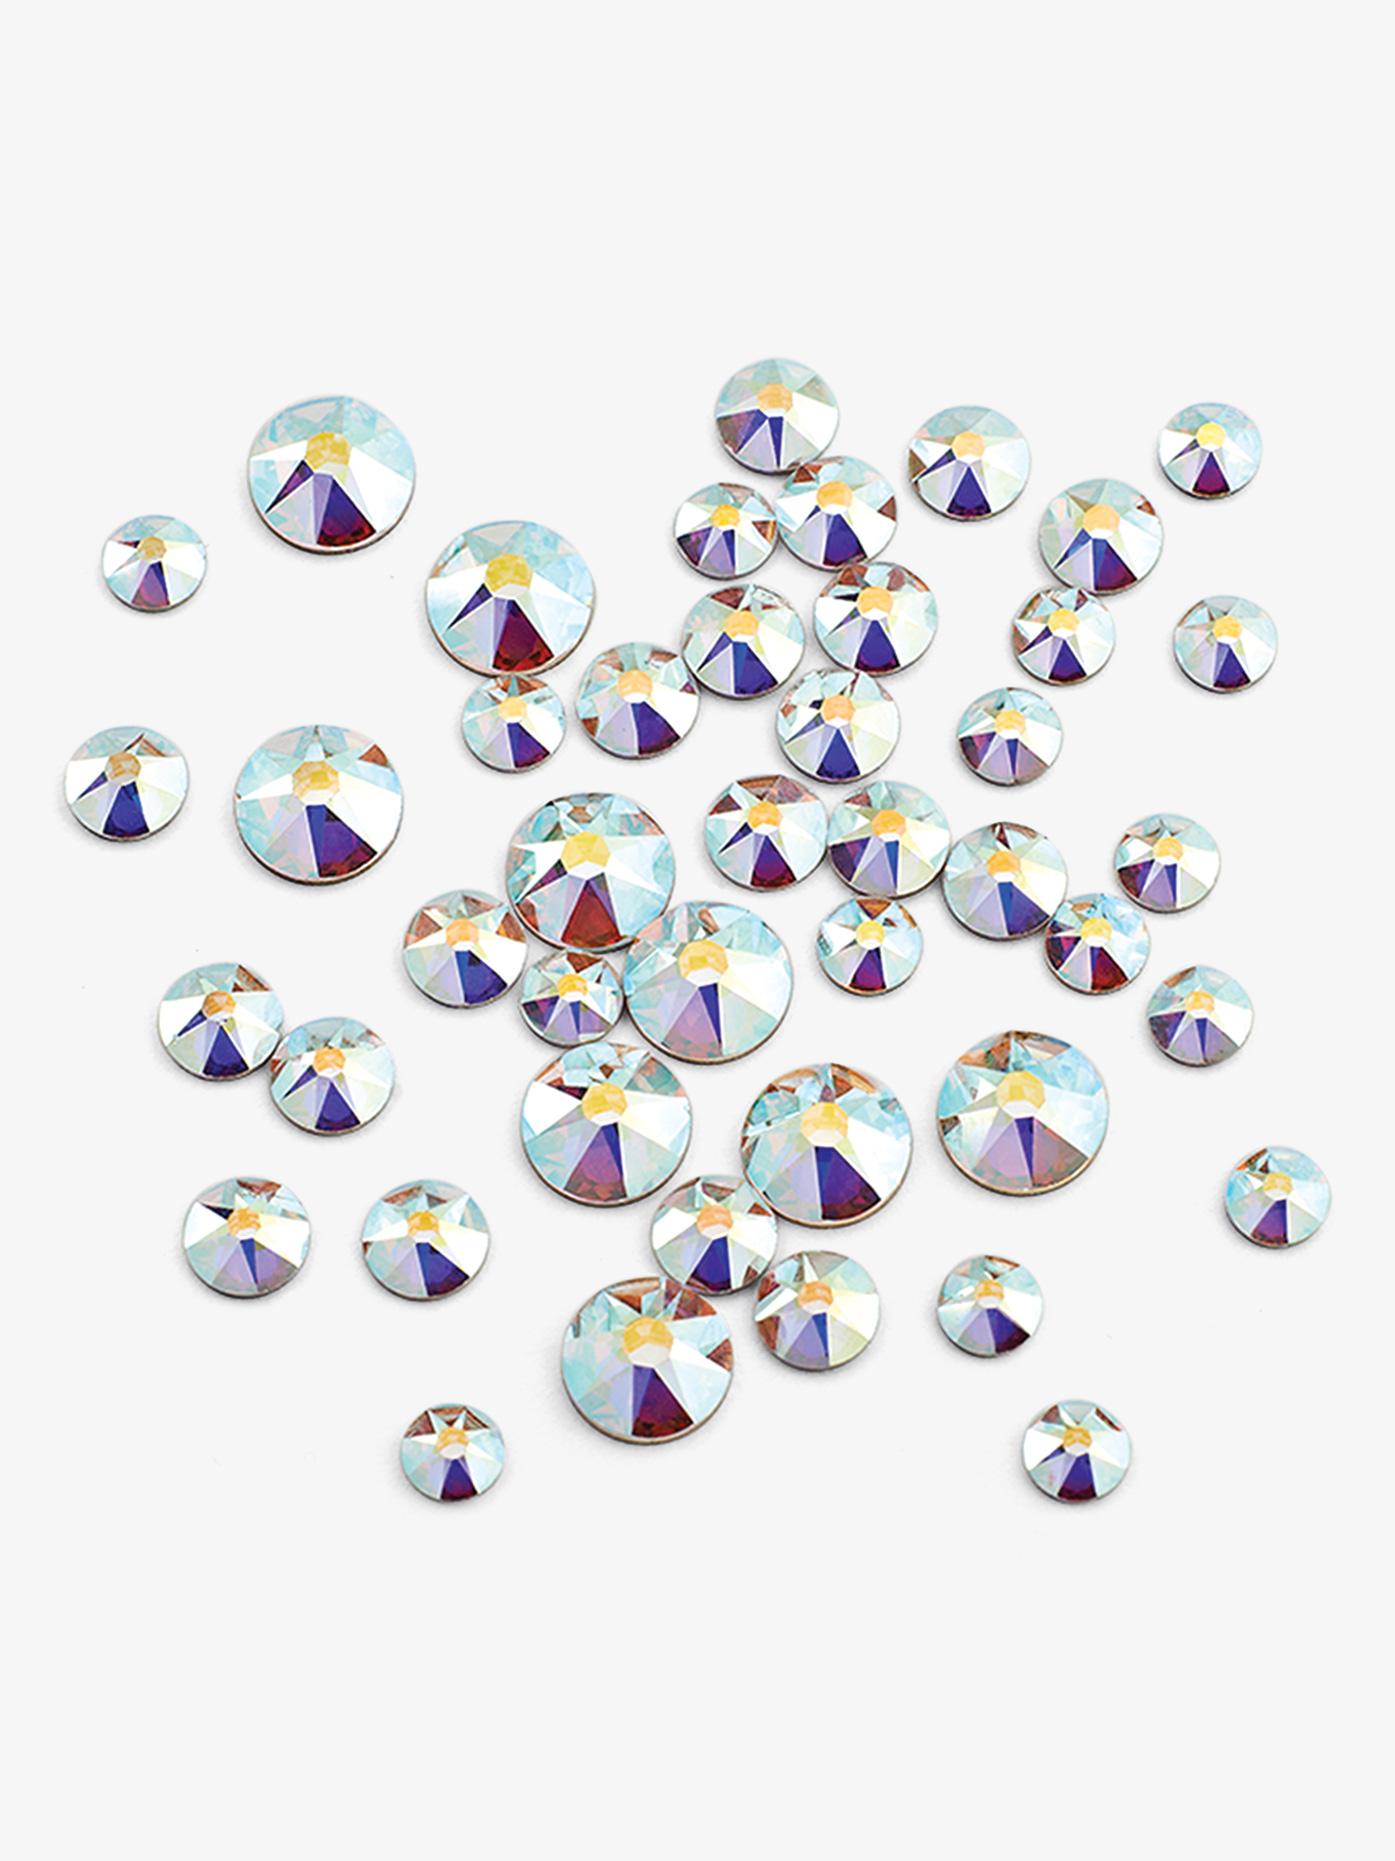 Rhinestones Unlimited Swarovski Xirius Aurora Borealis Crystals 20SS 1 Gross Pack RU003